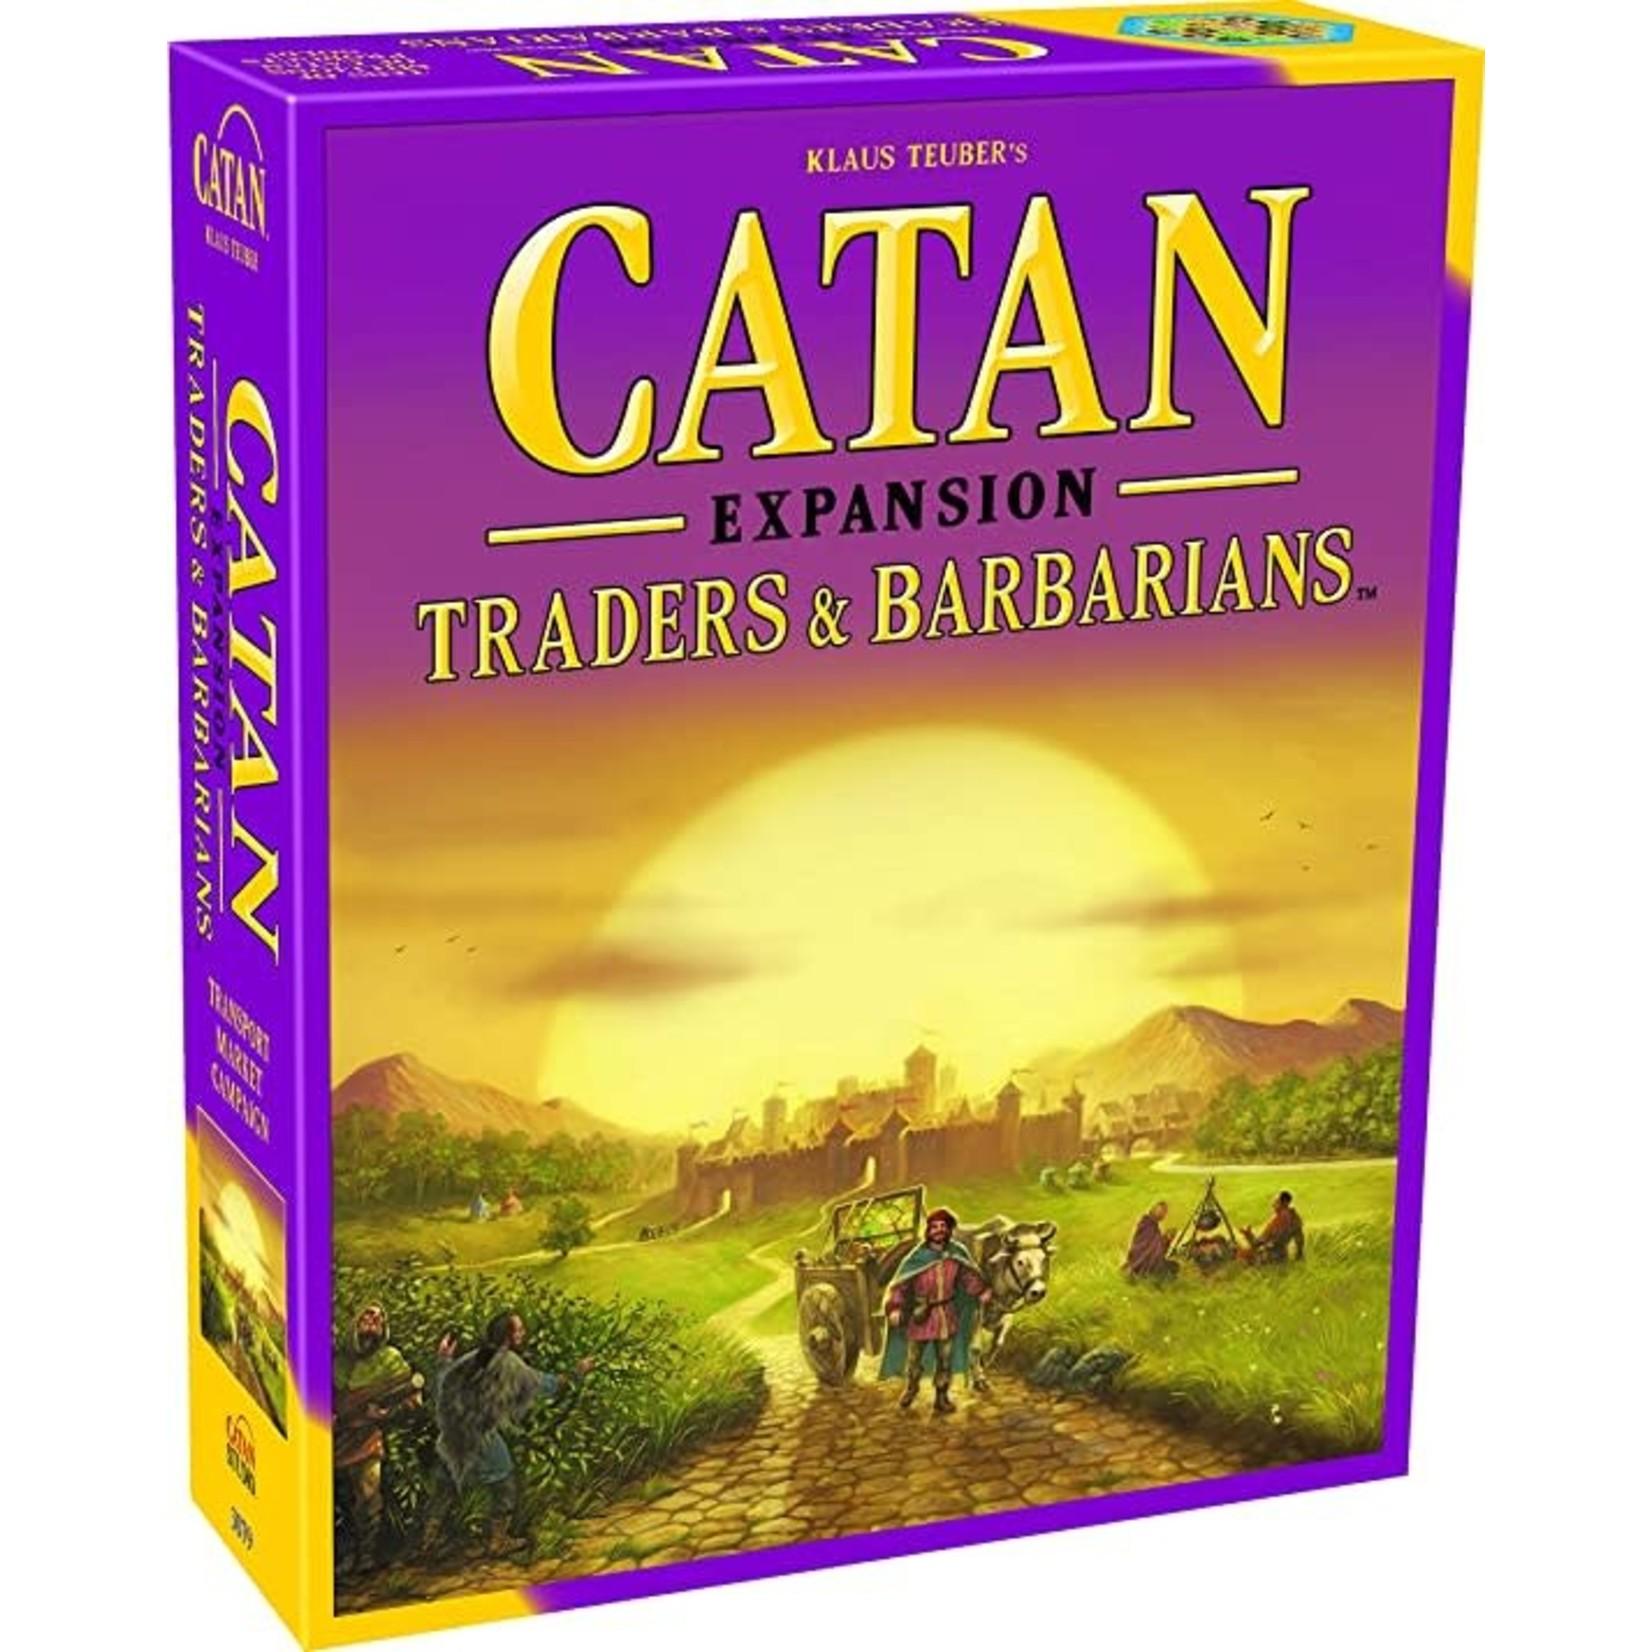 Catan Traders & Barbarians Expansion Board Game